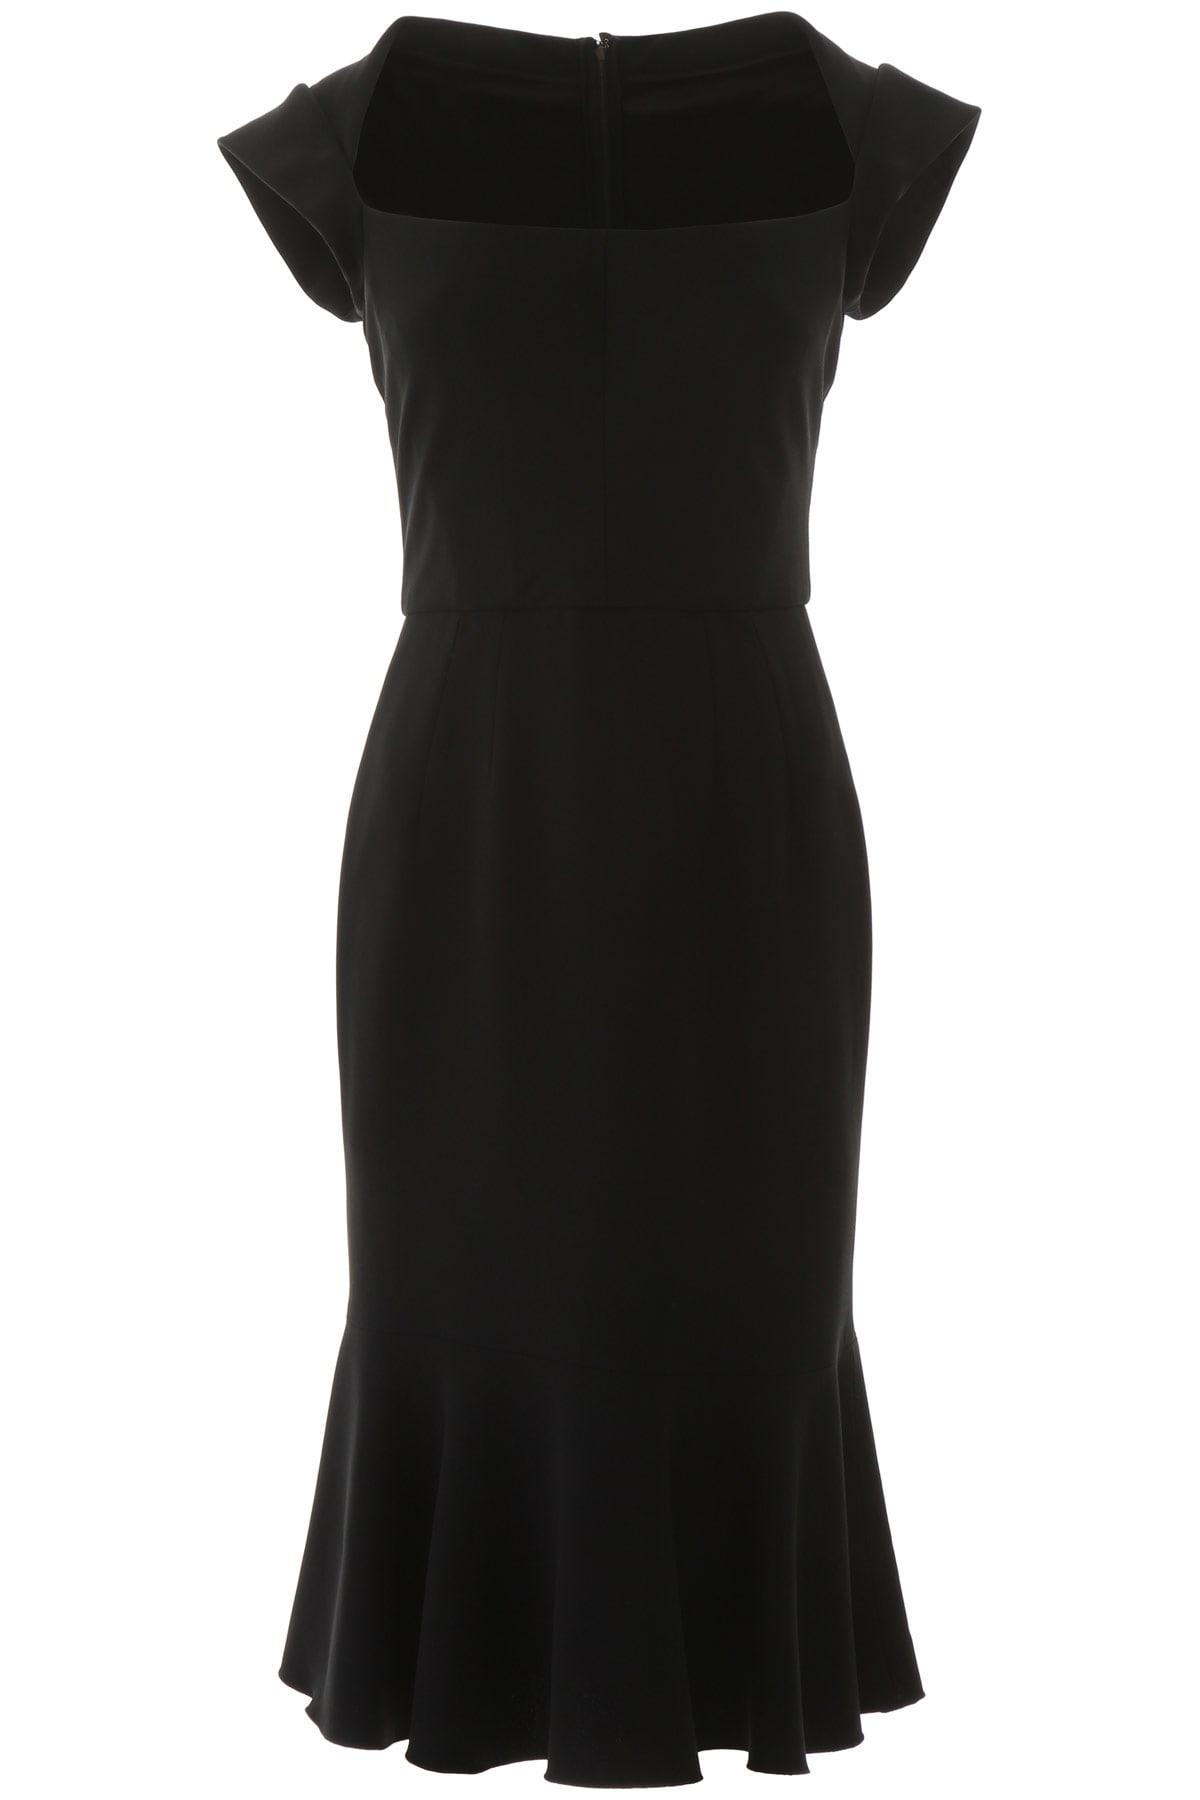 Buy Dolce & Gabbana Midi Cady Dress online, shop Dolce & Gabbana with free shipping